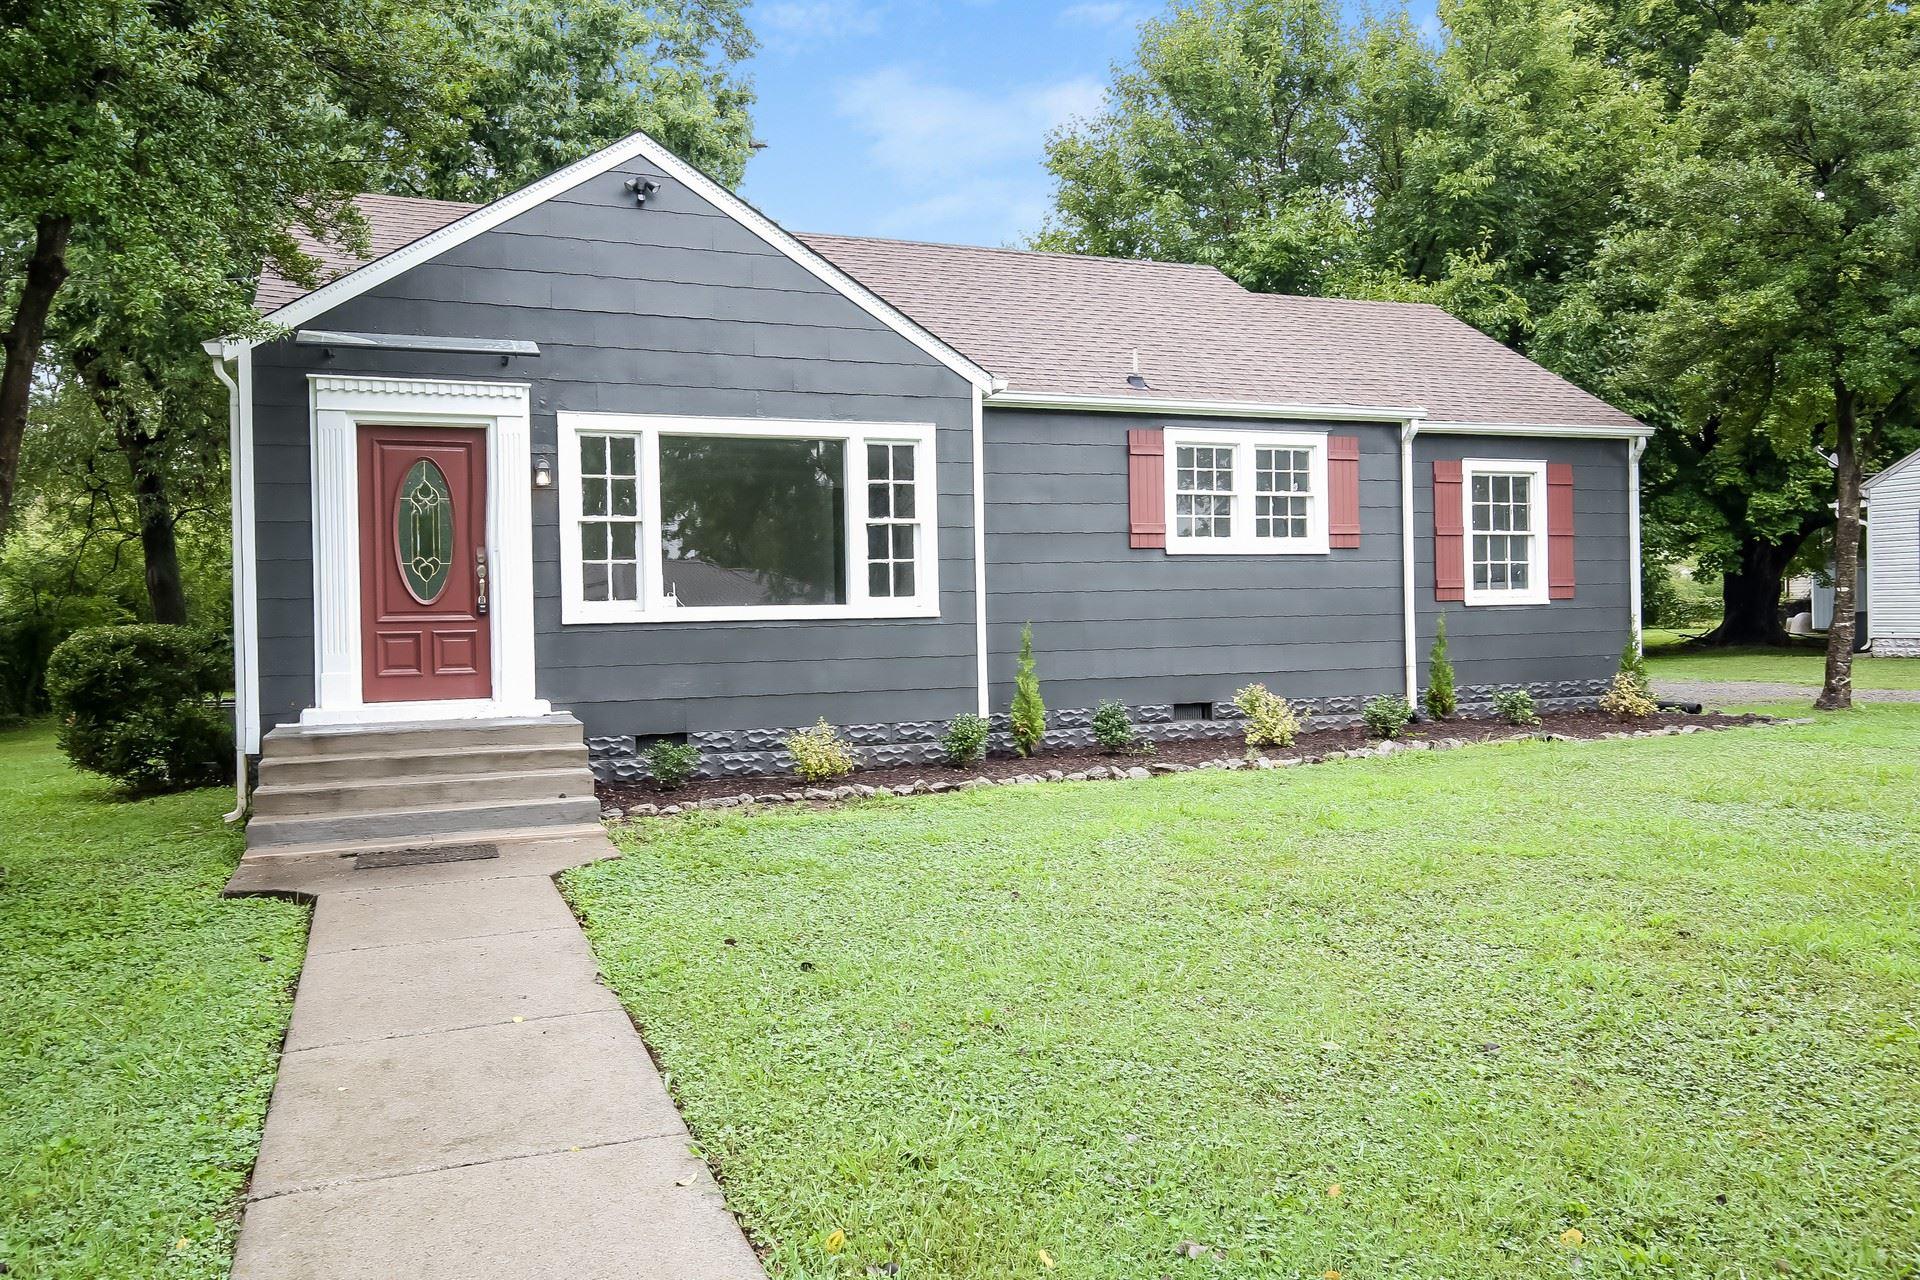 1519 Hilldale Dr, Murfreesboro, TN 37129 - MLS#: 2288080